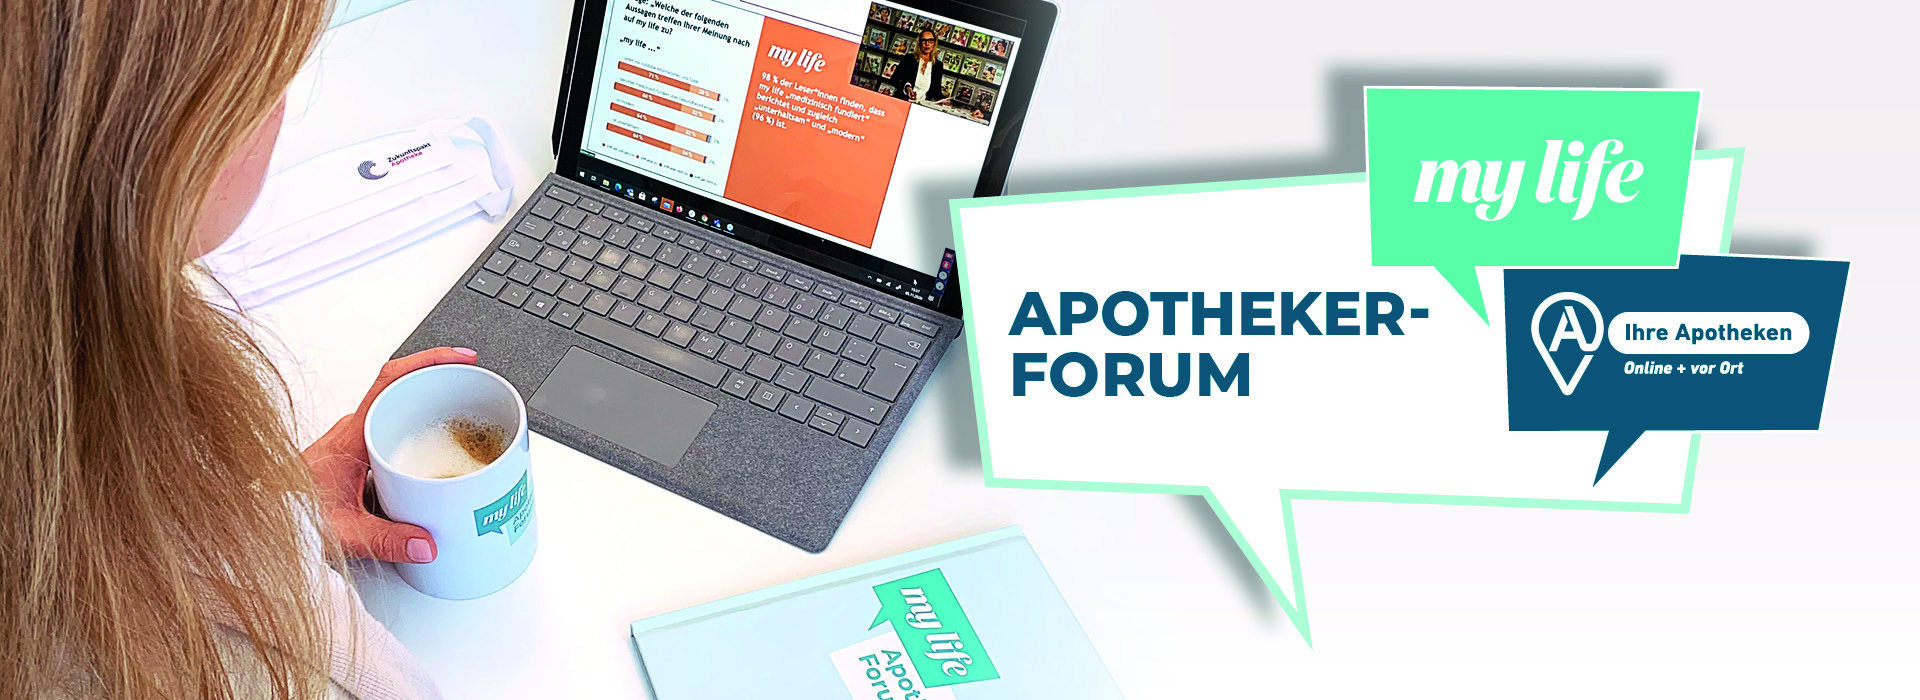 Apotheker forum